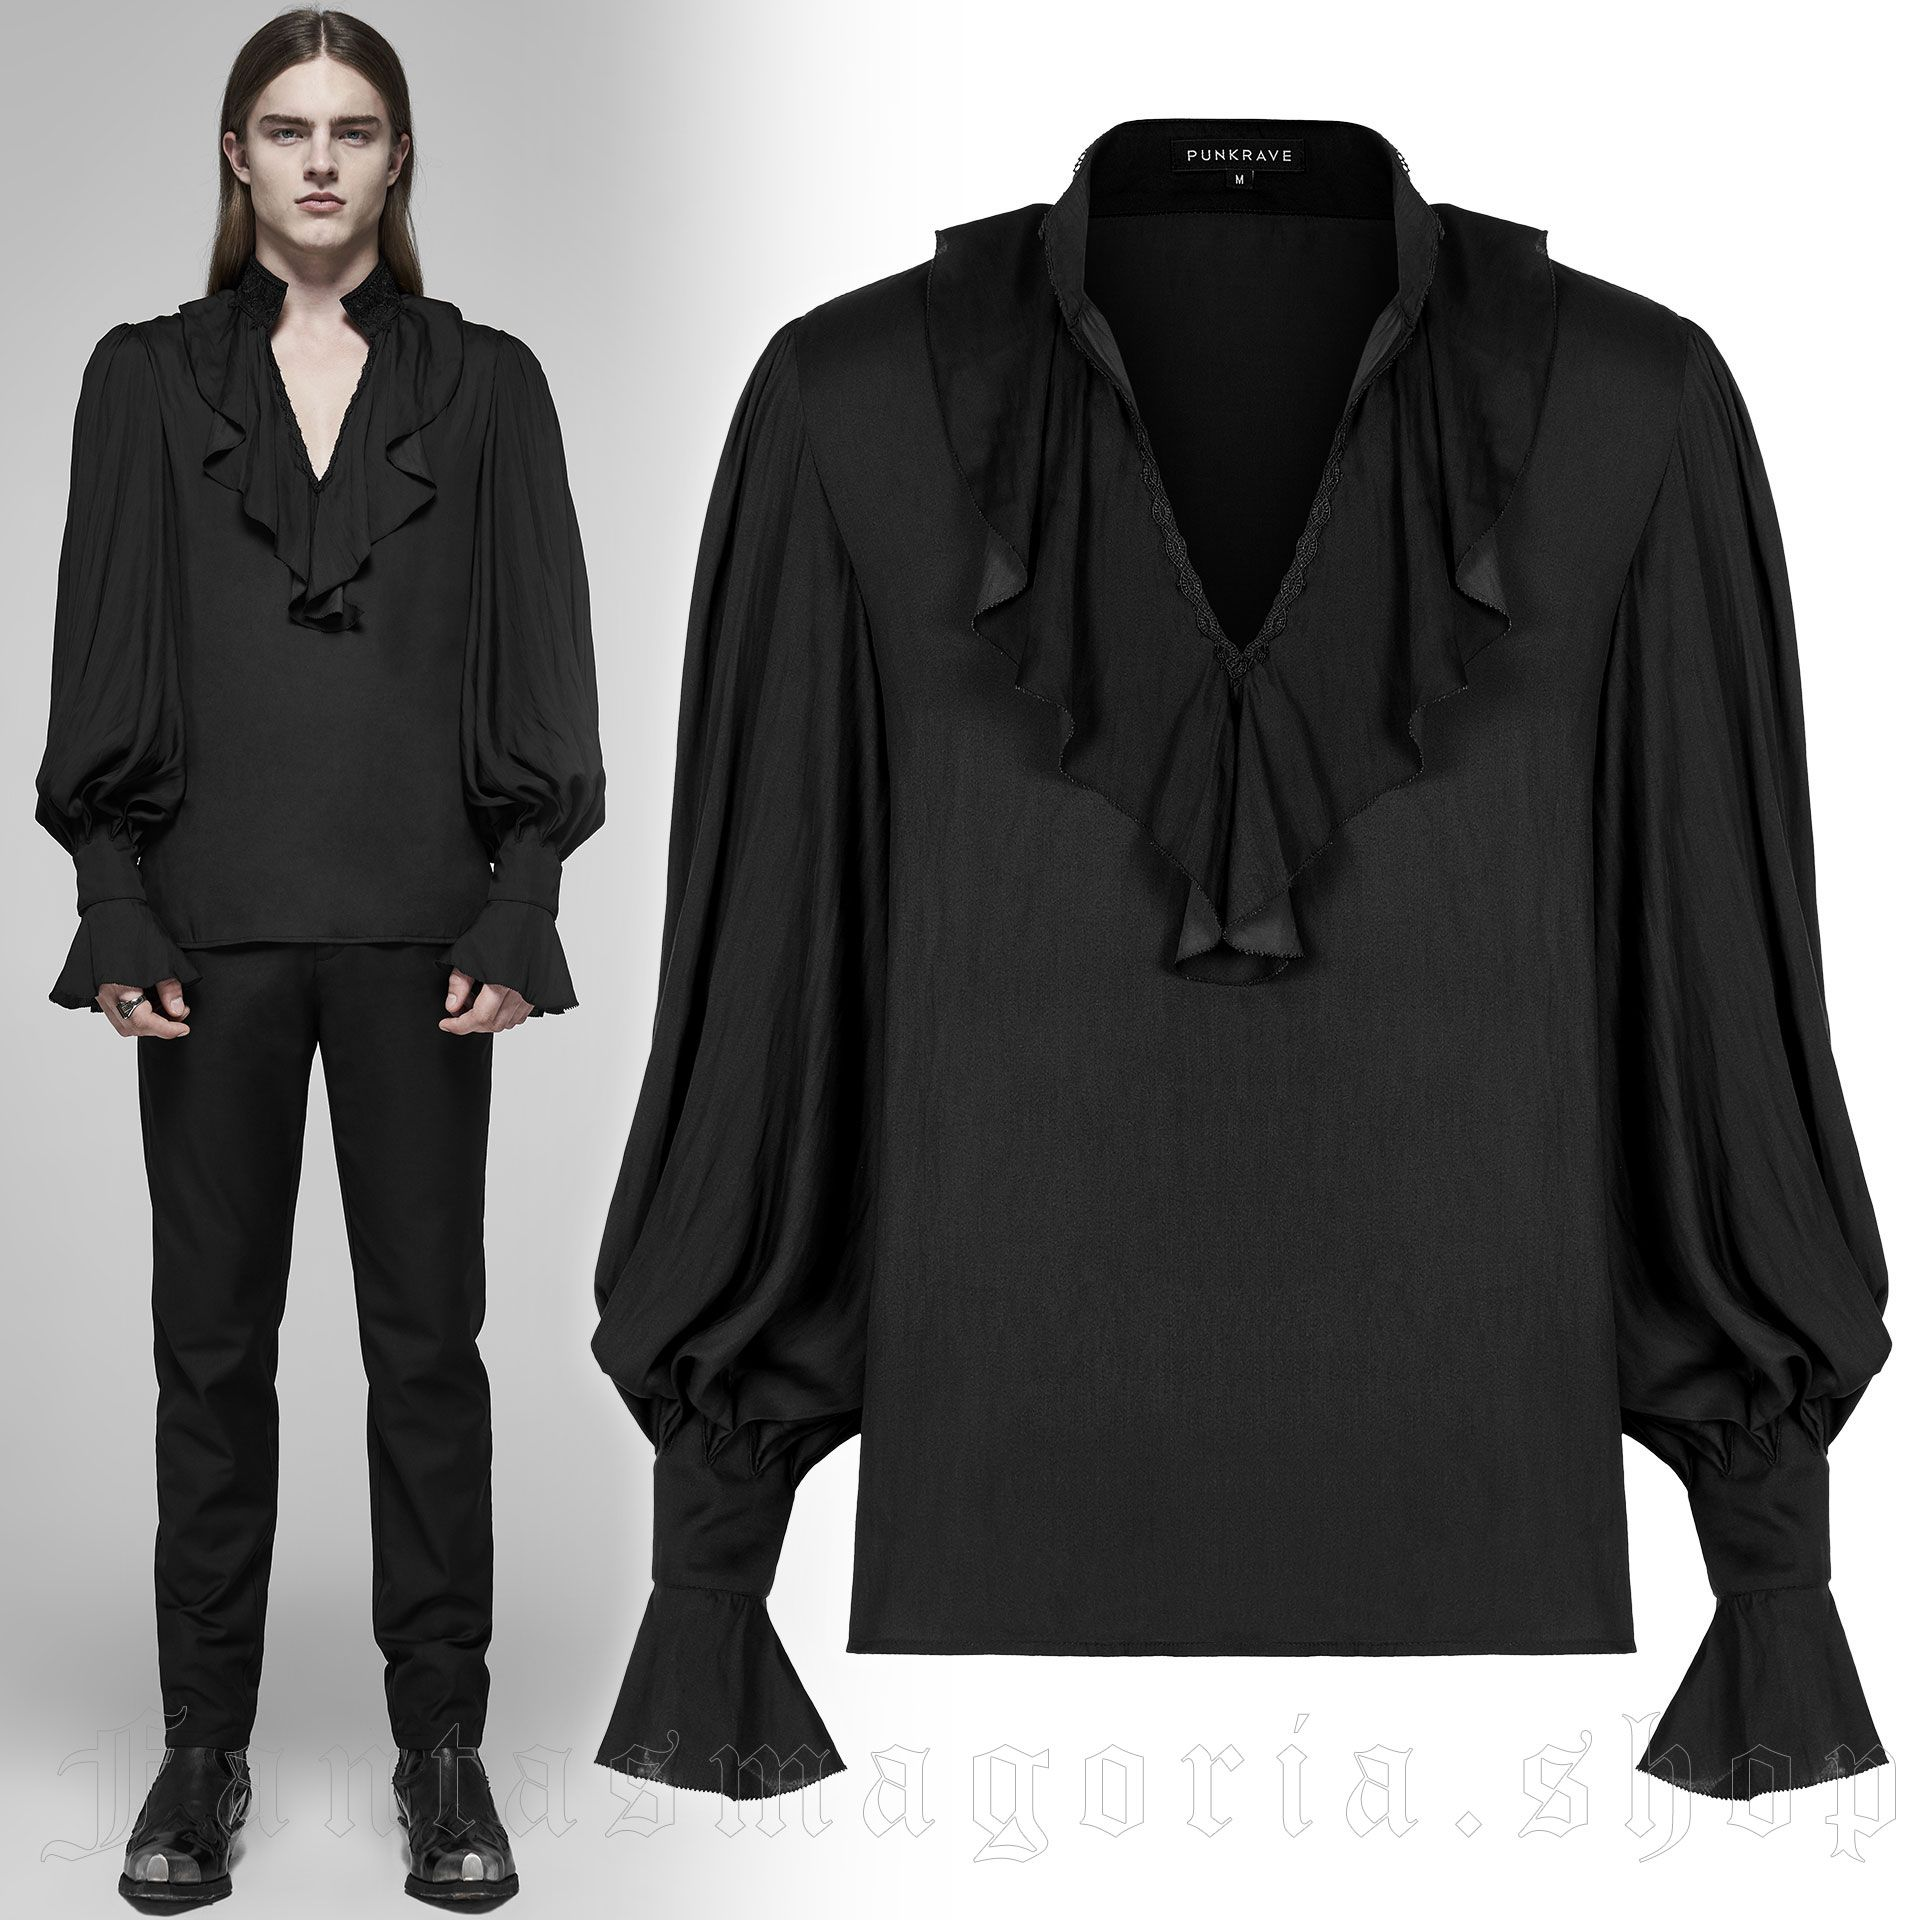 men's Silvanus Shirt by PUNK RAVE brand, code: WY-1152/BK